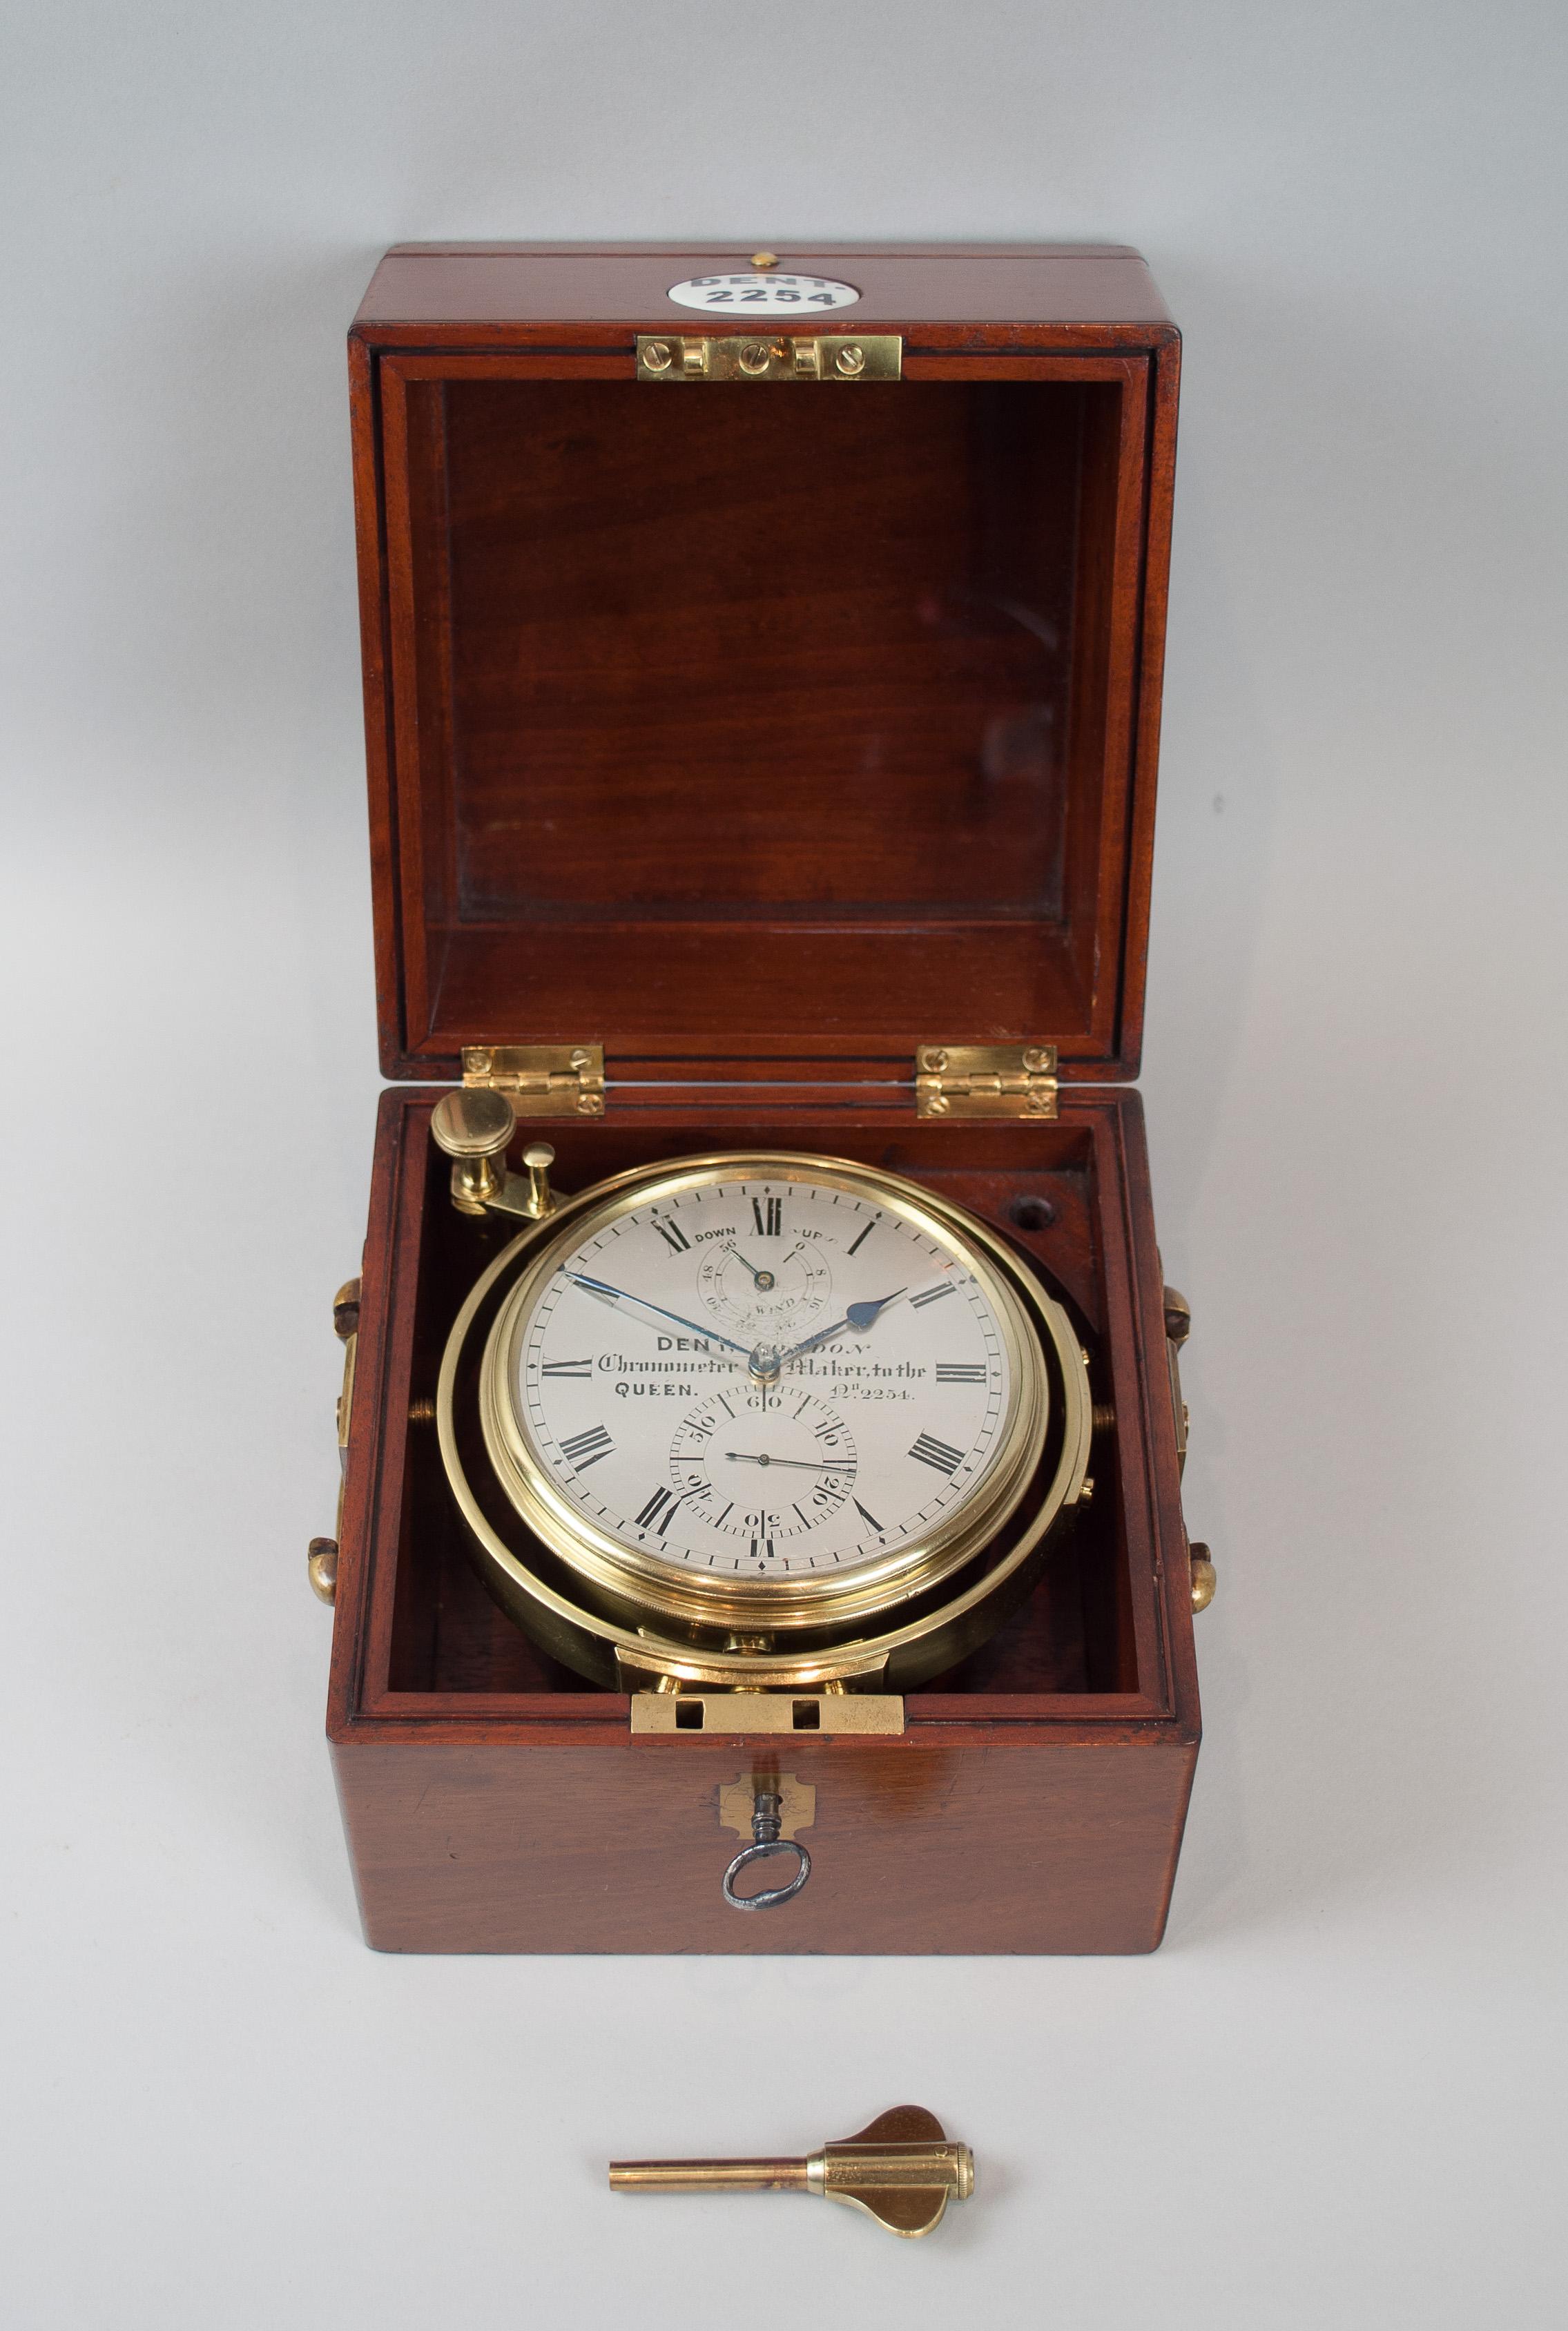 Story Antique Clocks image (1 of 11)